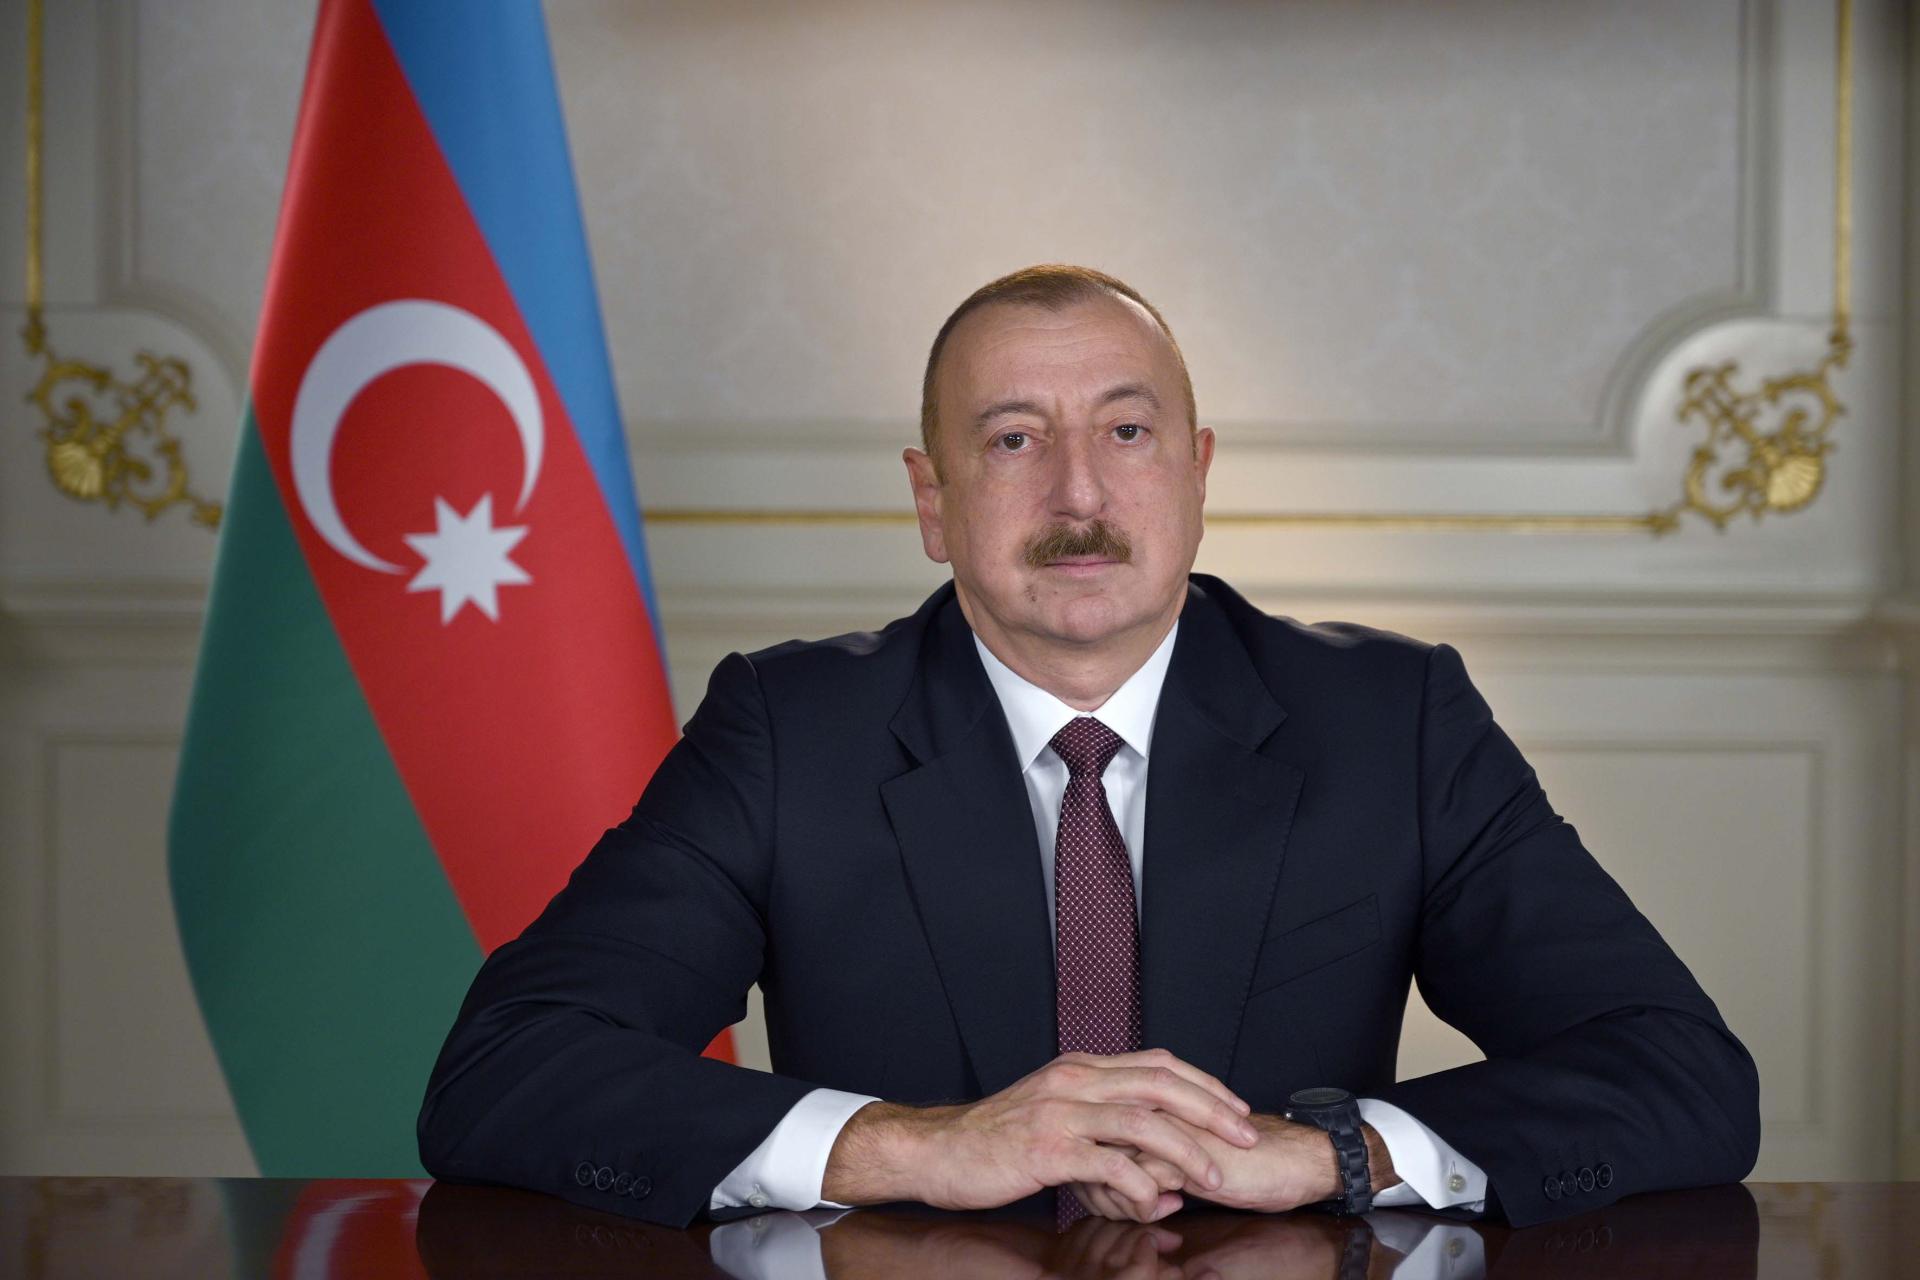 2020/03/ilham_aliyev_main_new_president_310120_1_1585664841.jpg